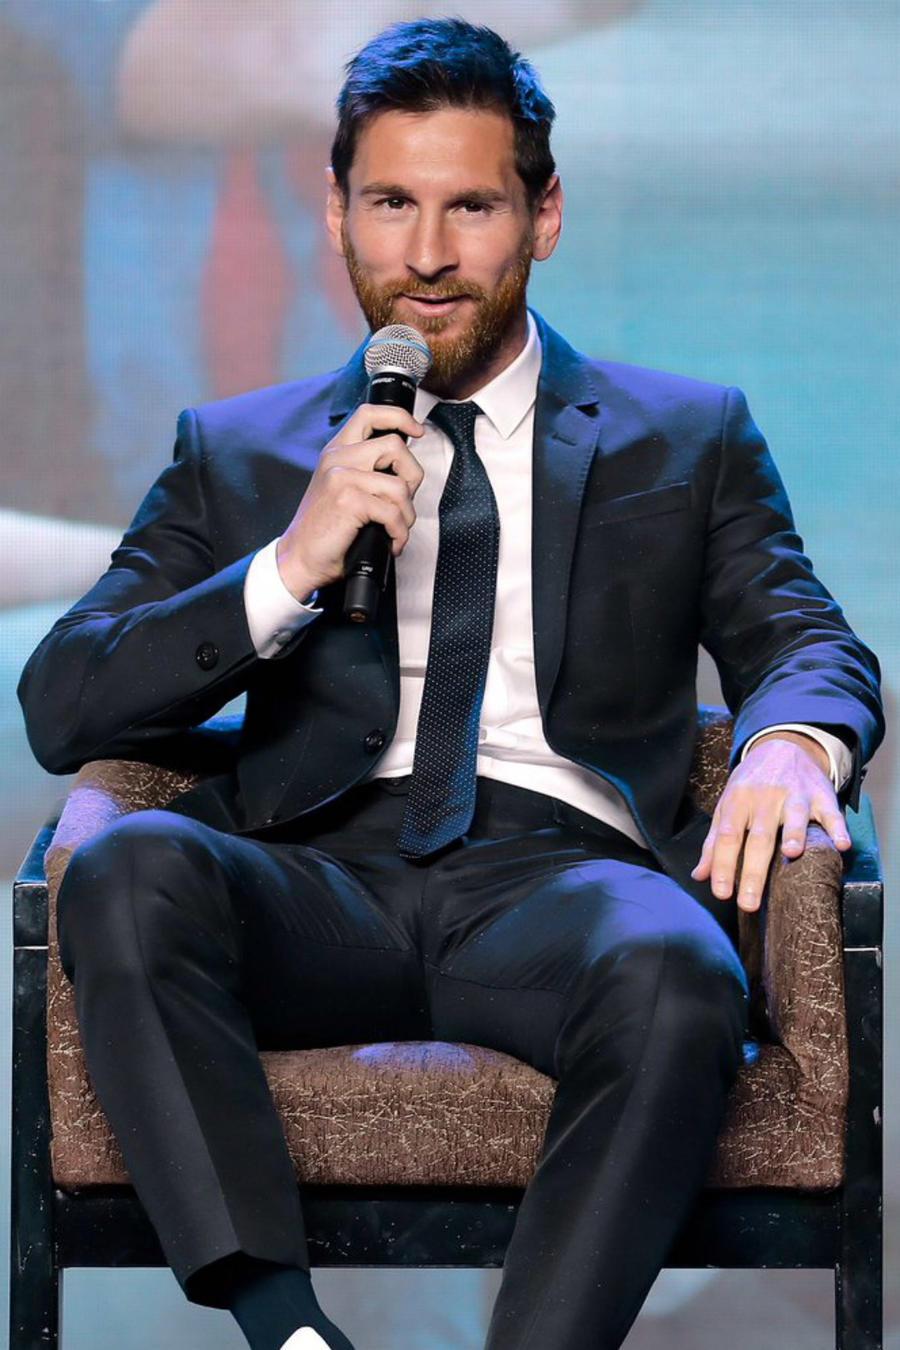 Lionel Messi a través de la cuenta de Twitter de Armani en 2017.